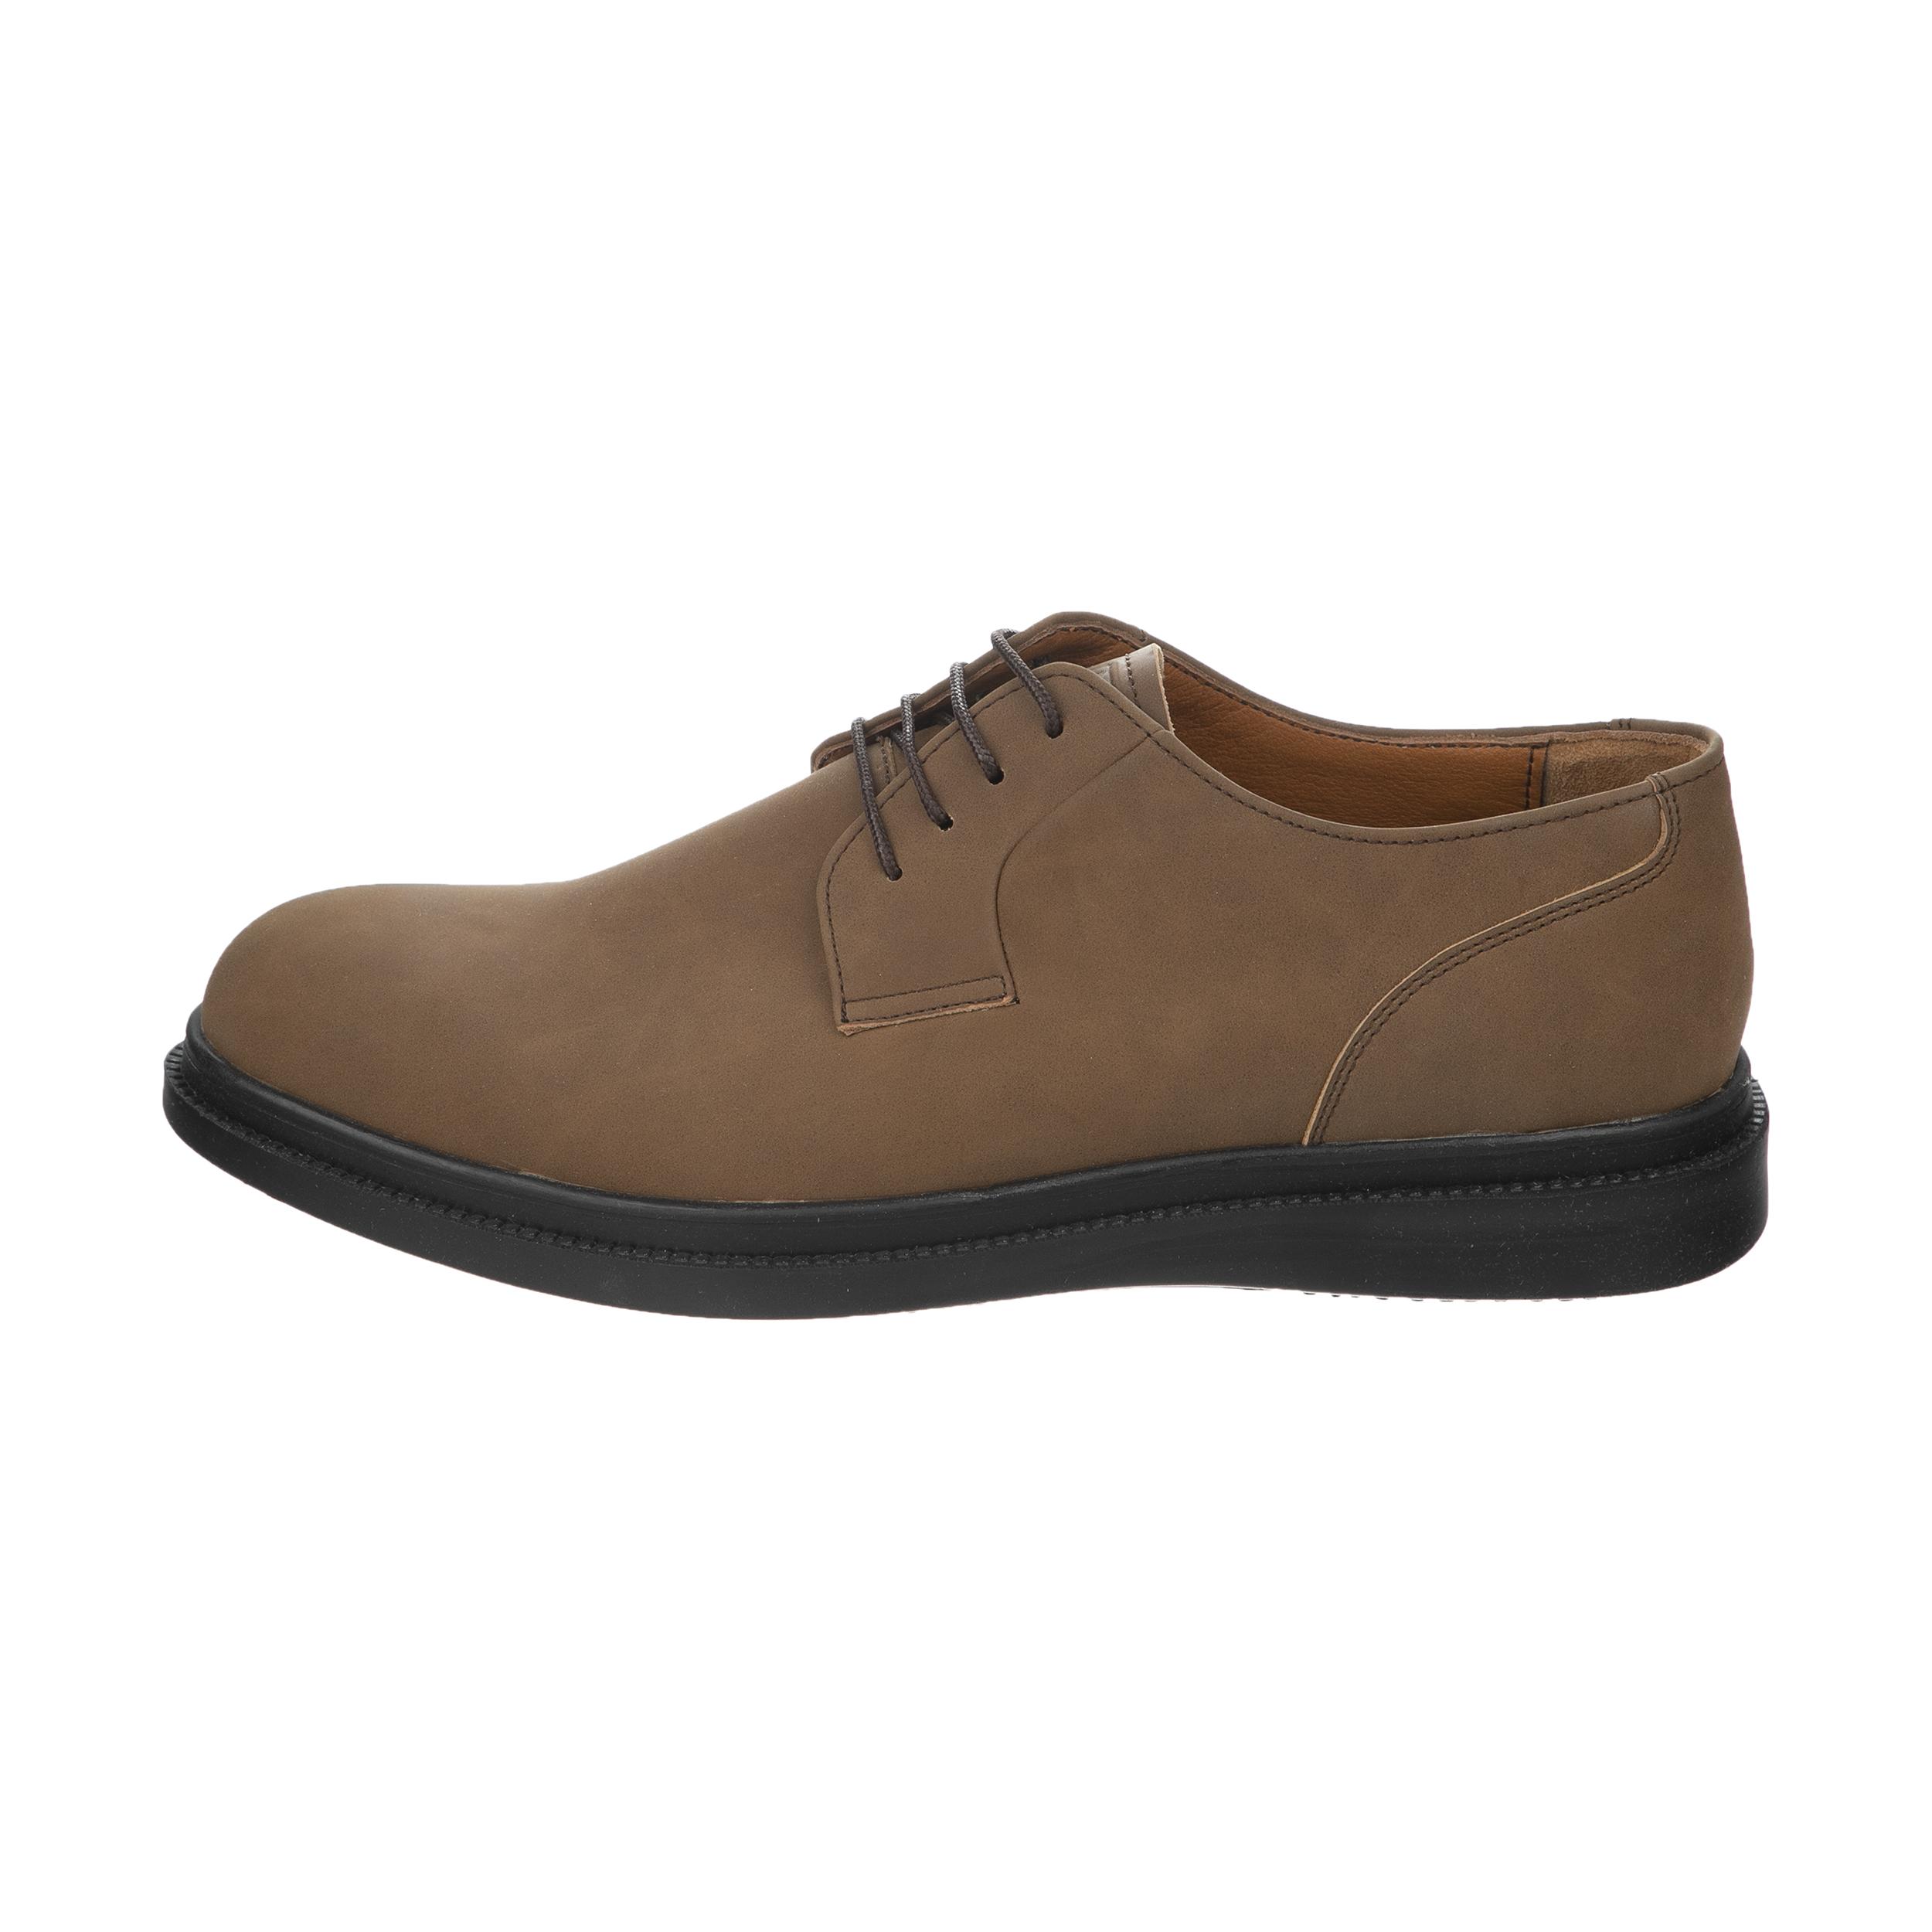 کفش روزمره مردانه مل اند موژ کد MC407-506N